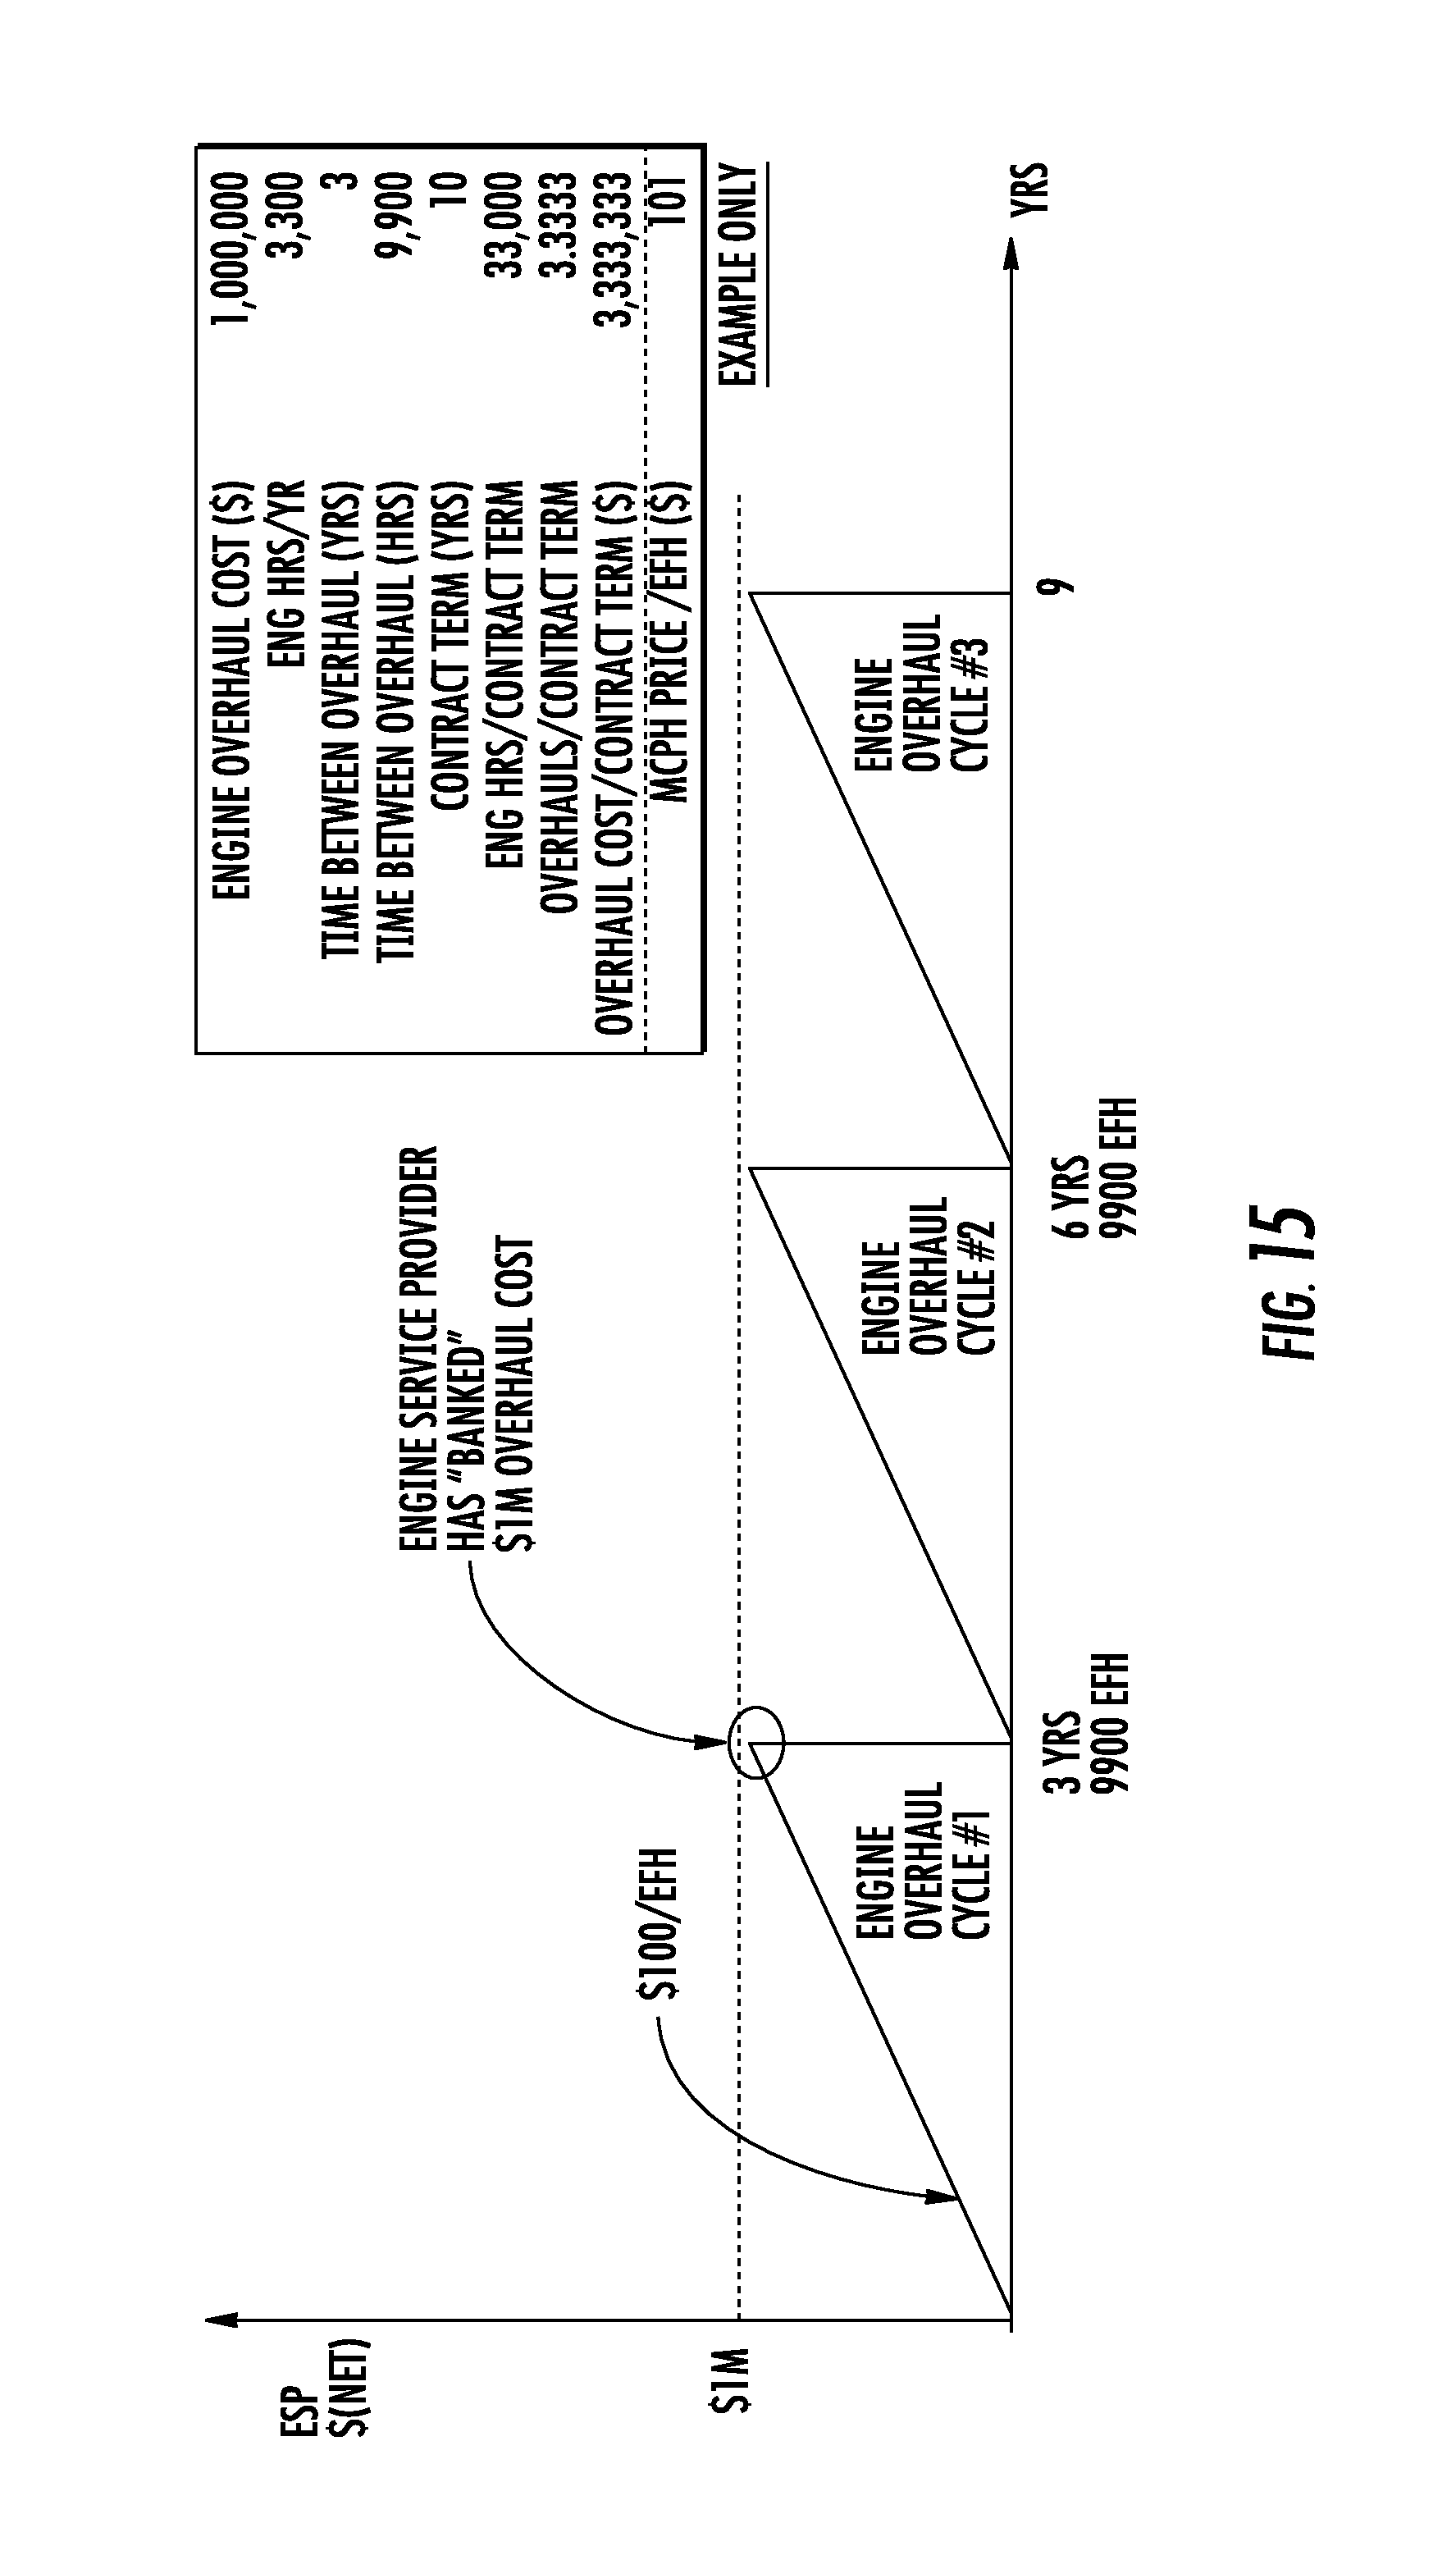 Patent US 9,766,619 B2